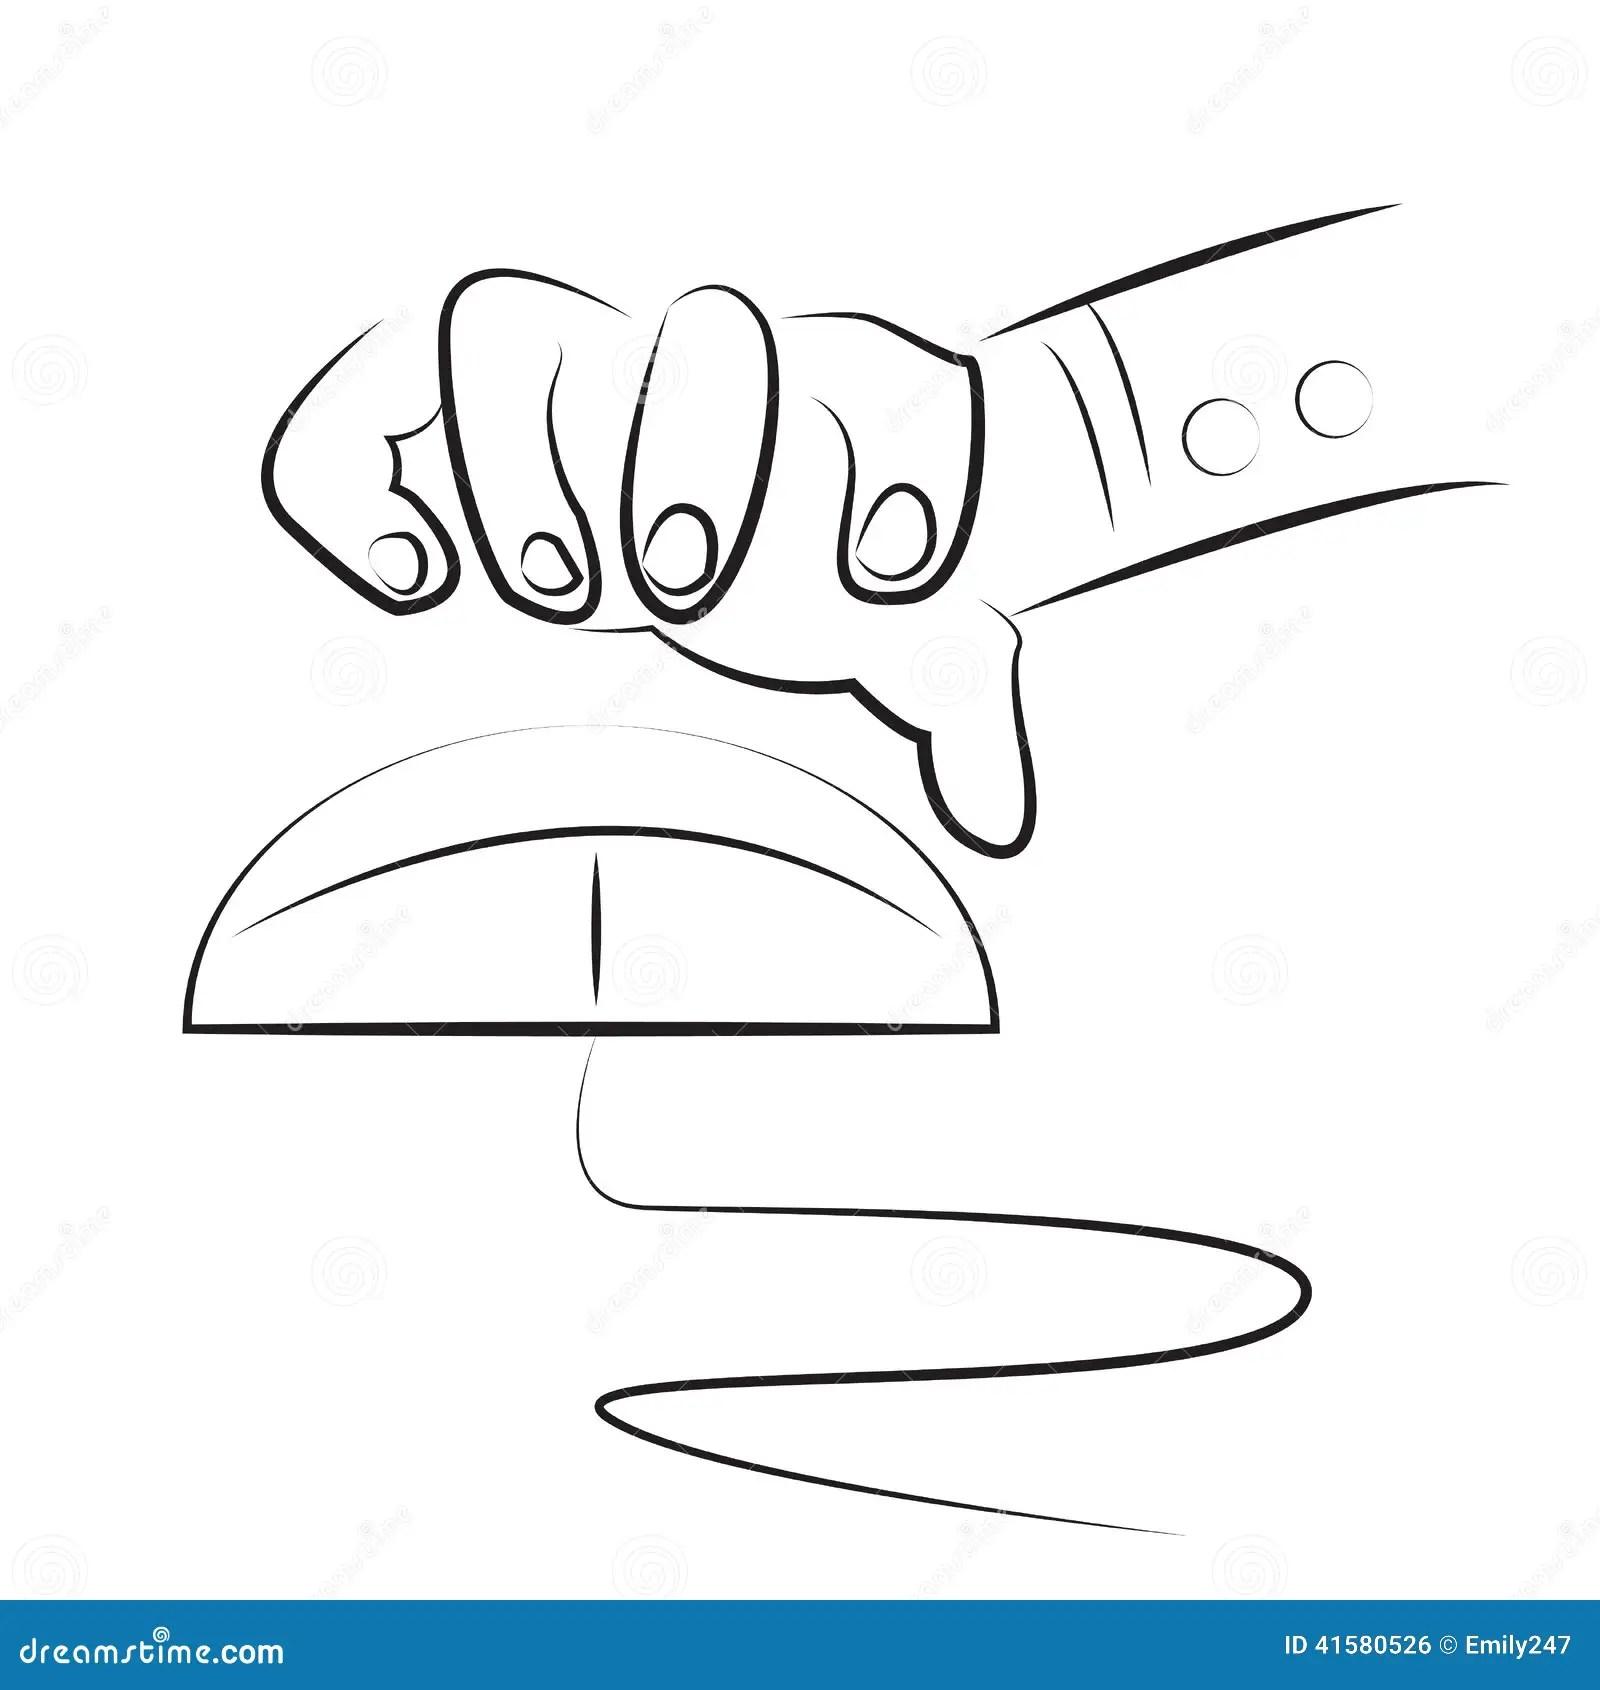 Fiberglasscircuitboardgreenoilplateuniversalboardtestboard